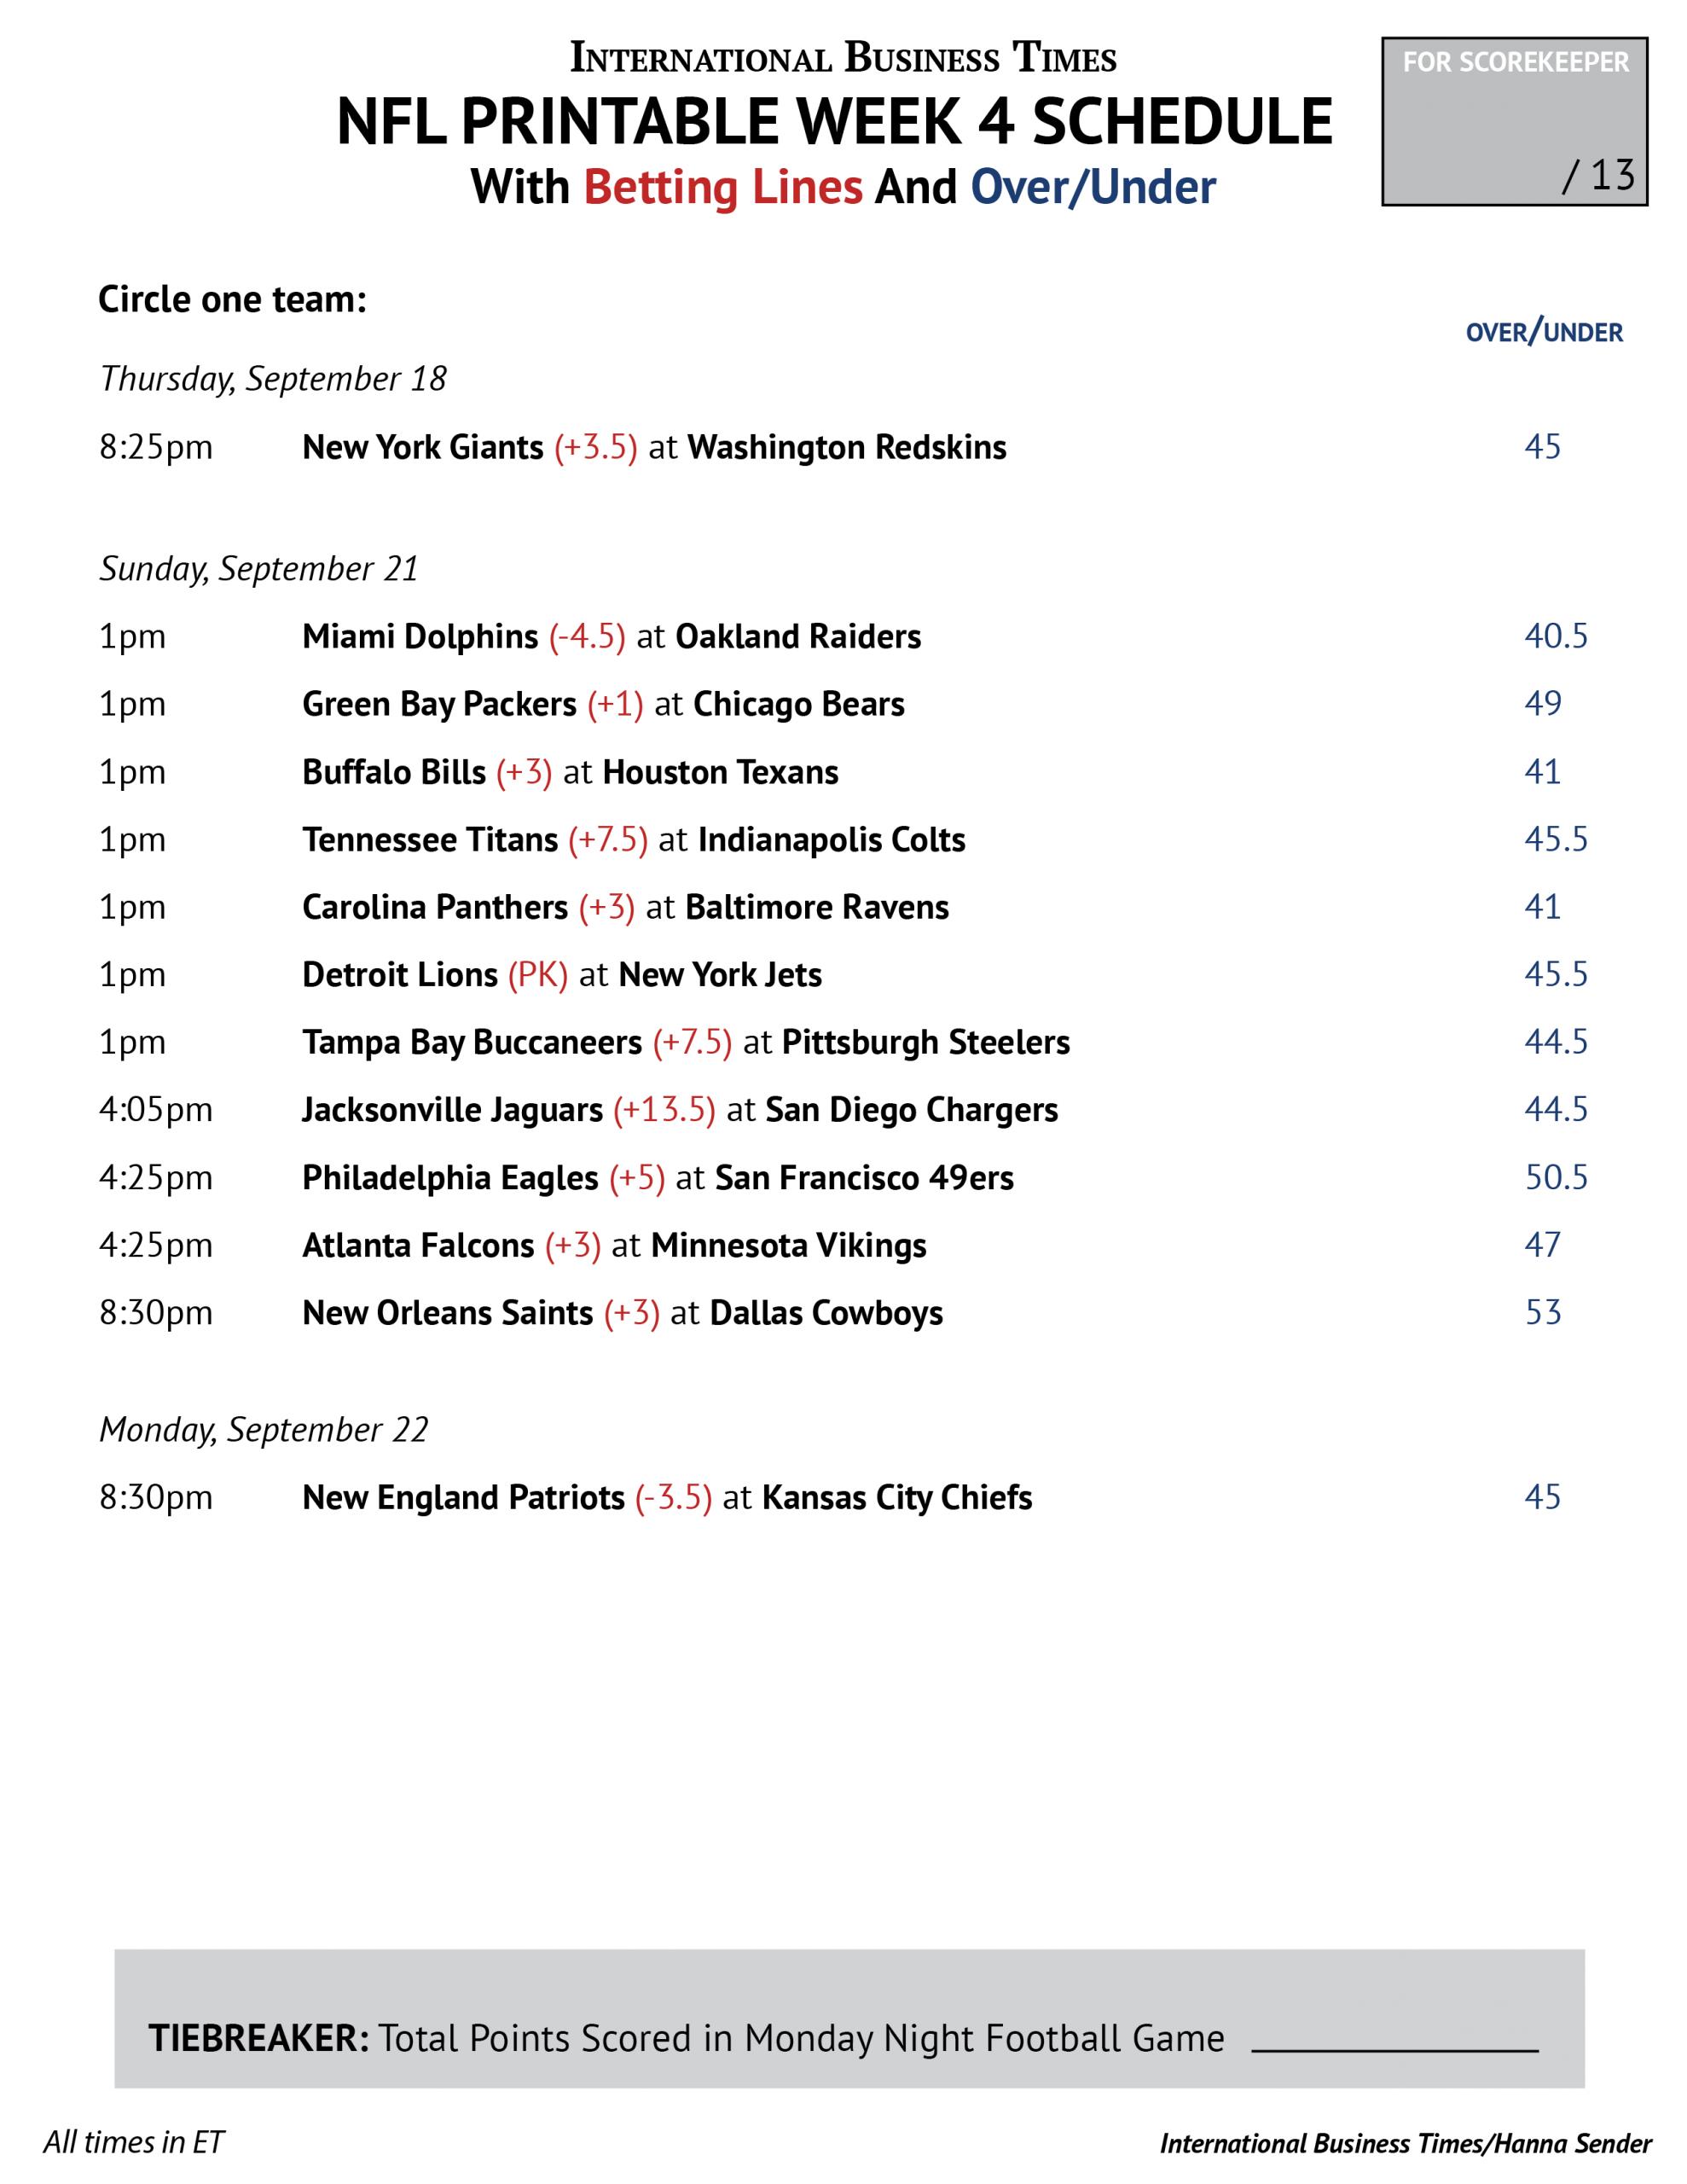 Nfl Office Pool 2014: Printable Week 4 Schedule With Betting